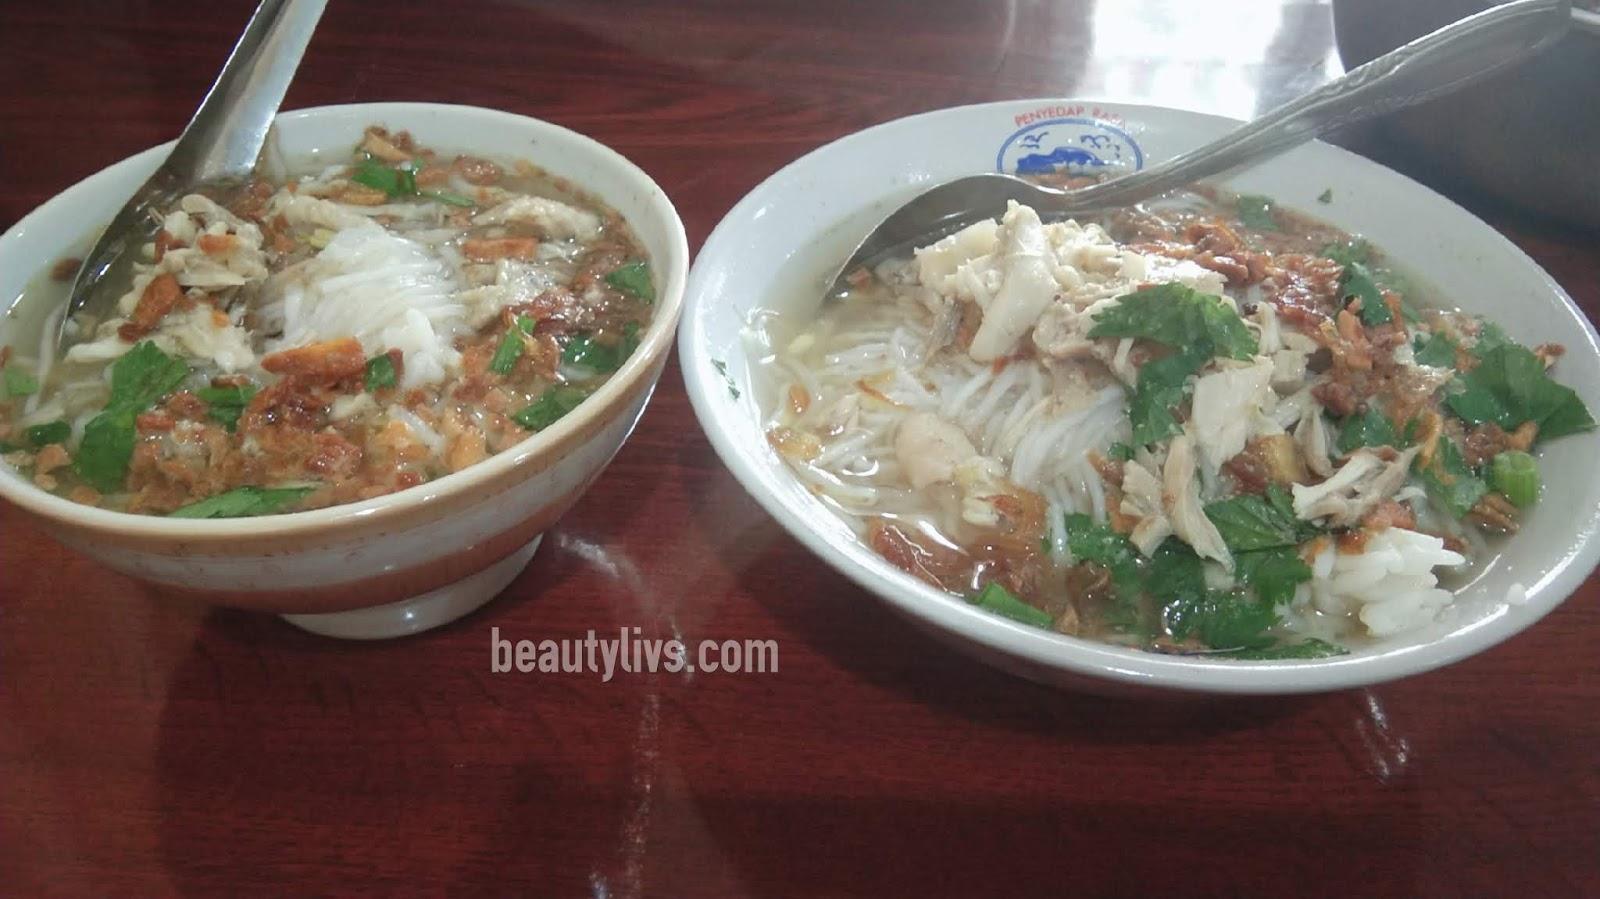 makan soto murah enak   soto semarang sederhana balikpapan rhythm  soul  olivia Resepi Masakan Warung Enak dan Mudah